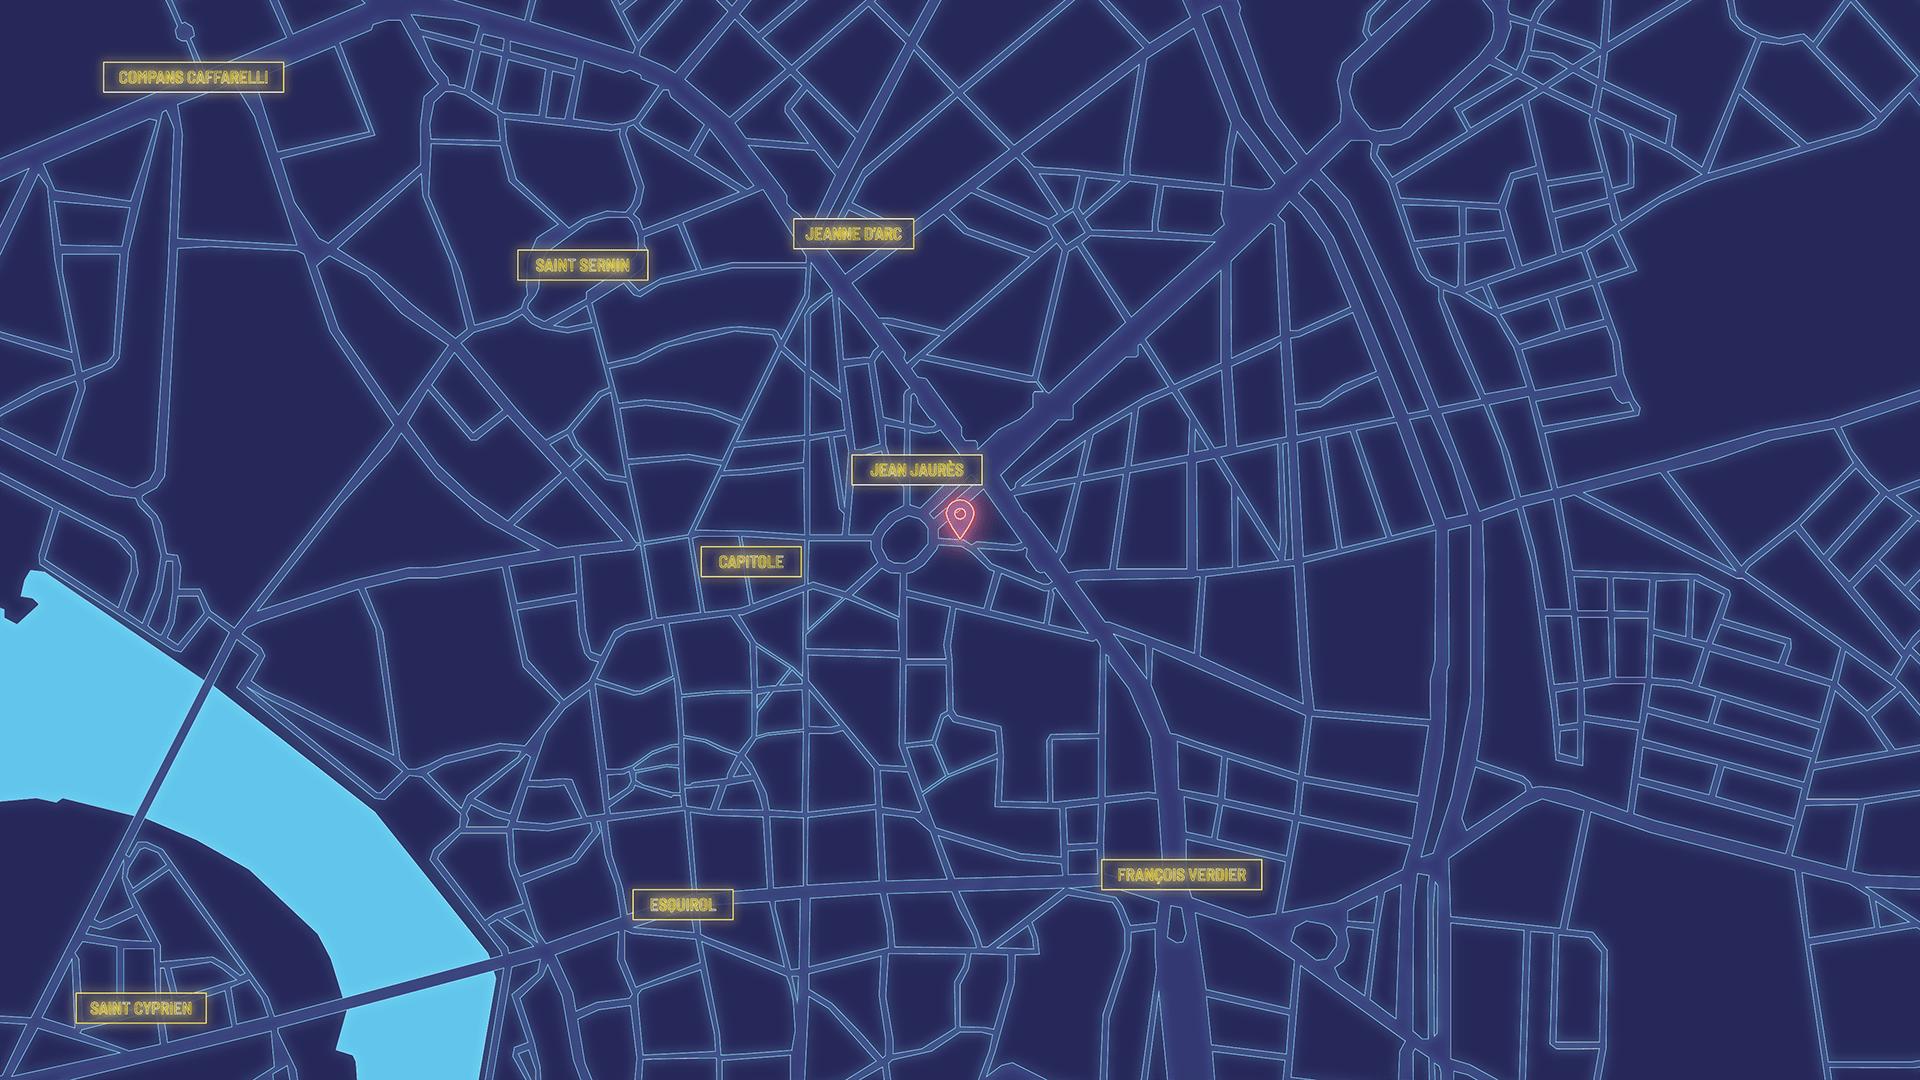 cosmopolitain restaurant bar map neon